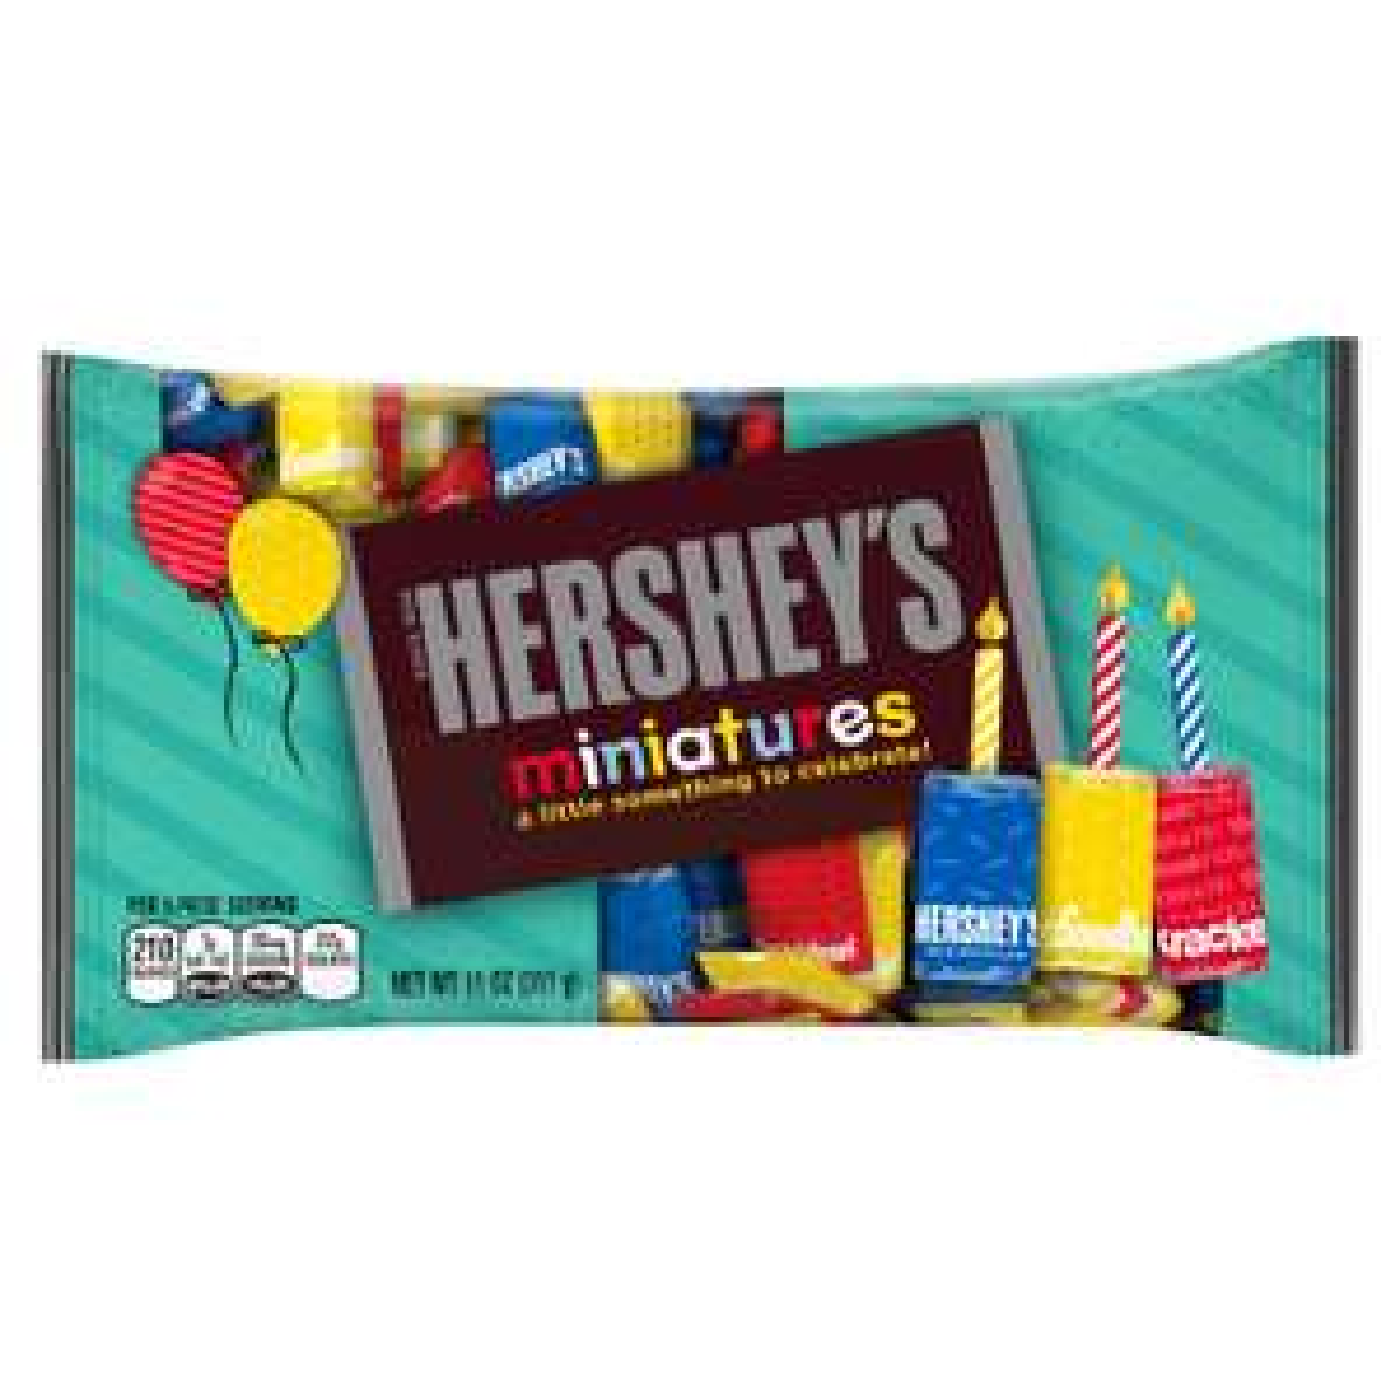 Hersheys Minatures 311g (11oz) £1.99 @ B&M